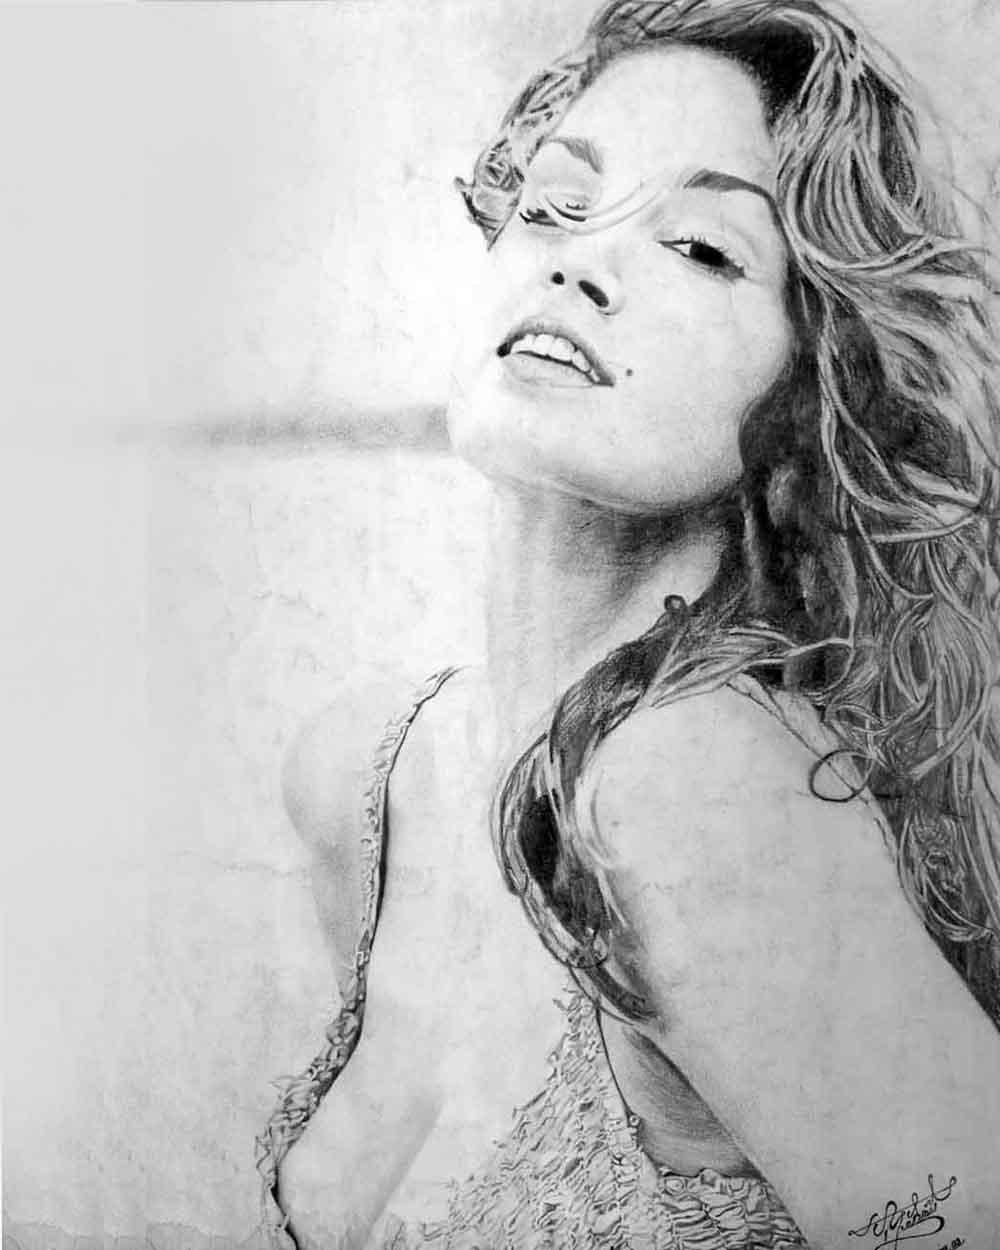 Cindy Crawford Kara Kalem Çizimi Antalyada